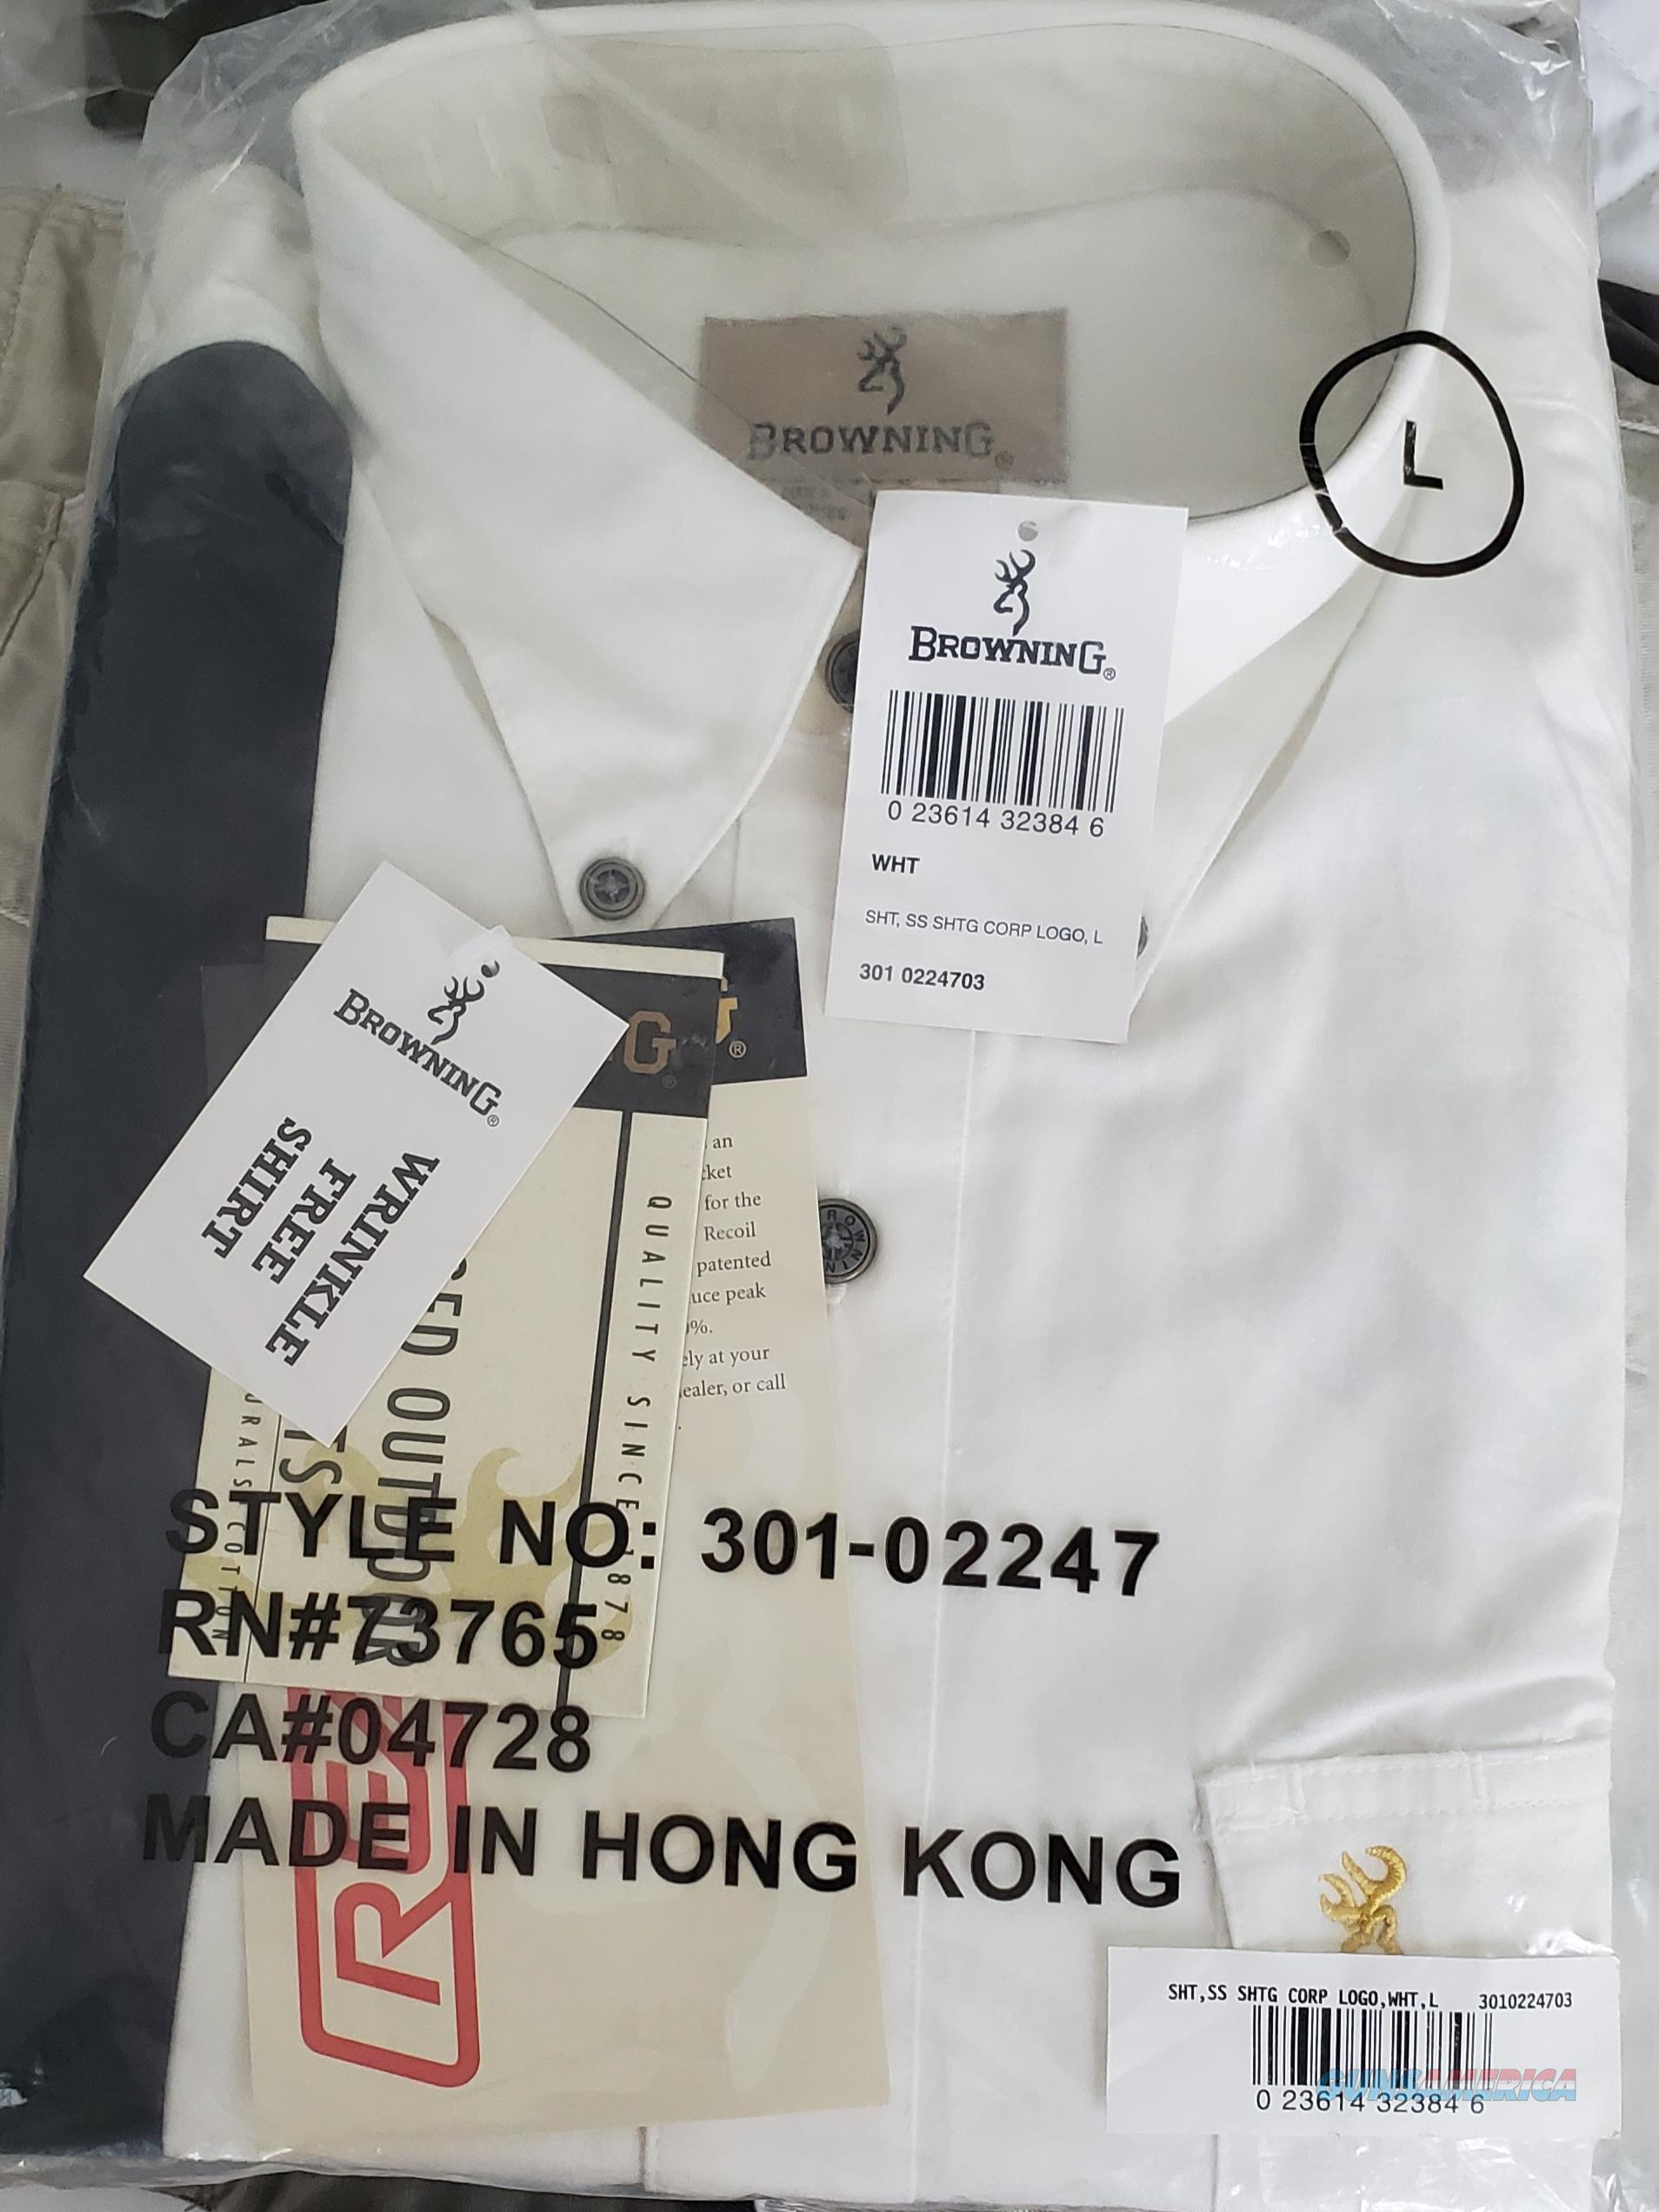 Browning White Men's Short Sleeve Shooting Shirt w/ Corp Logo NEW! Size L  Non-Guns > Hunting Clothing and Equipment > Clothing > Shirts